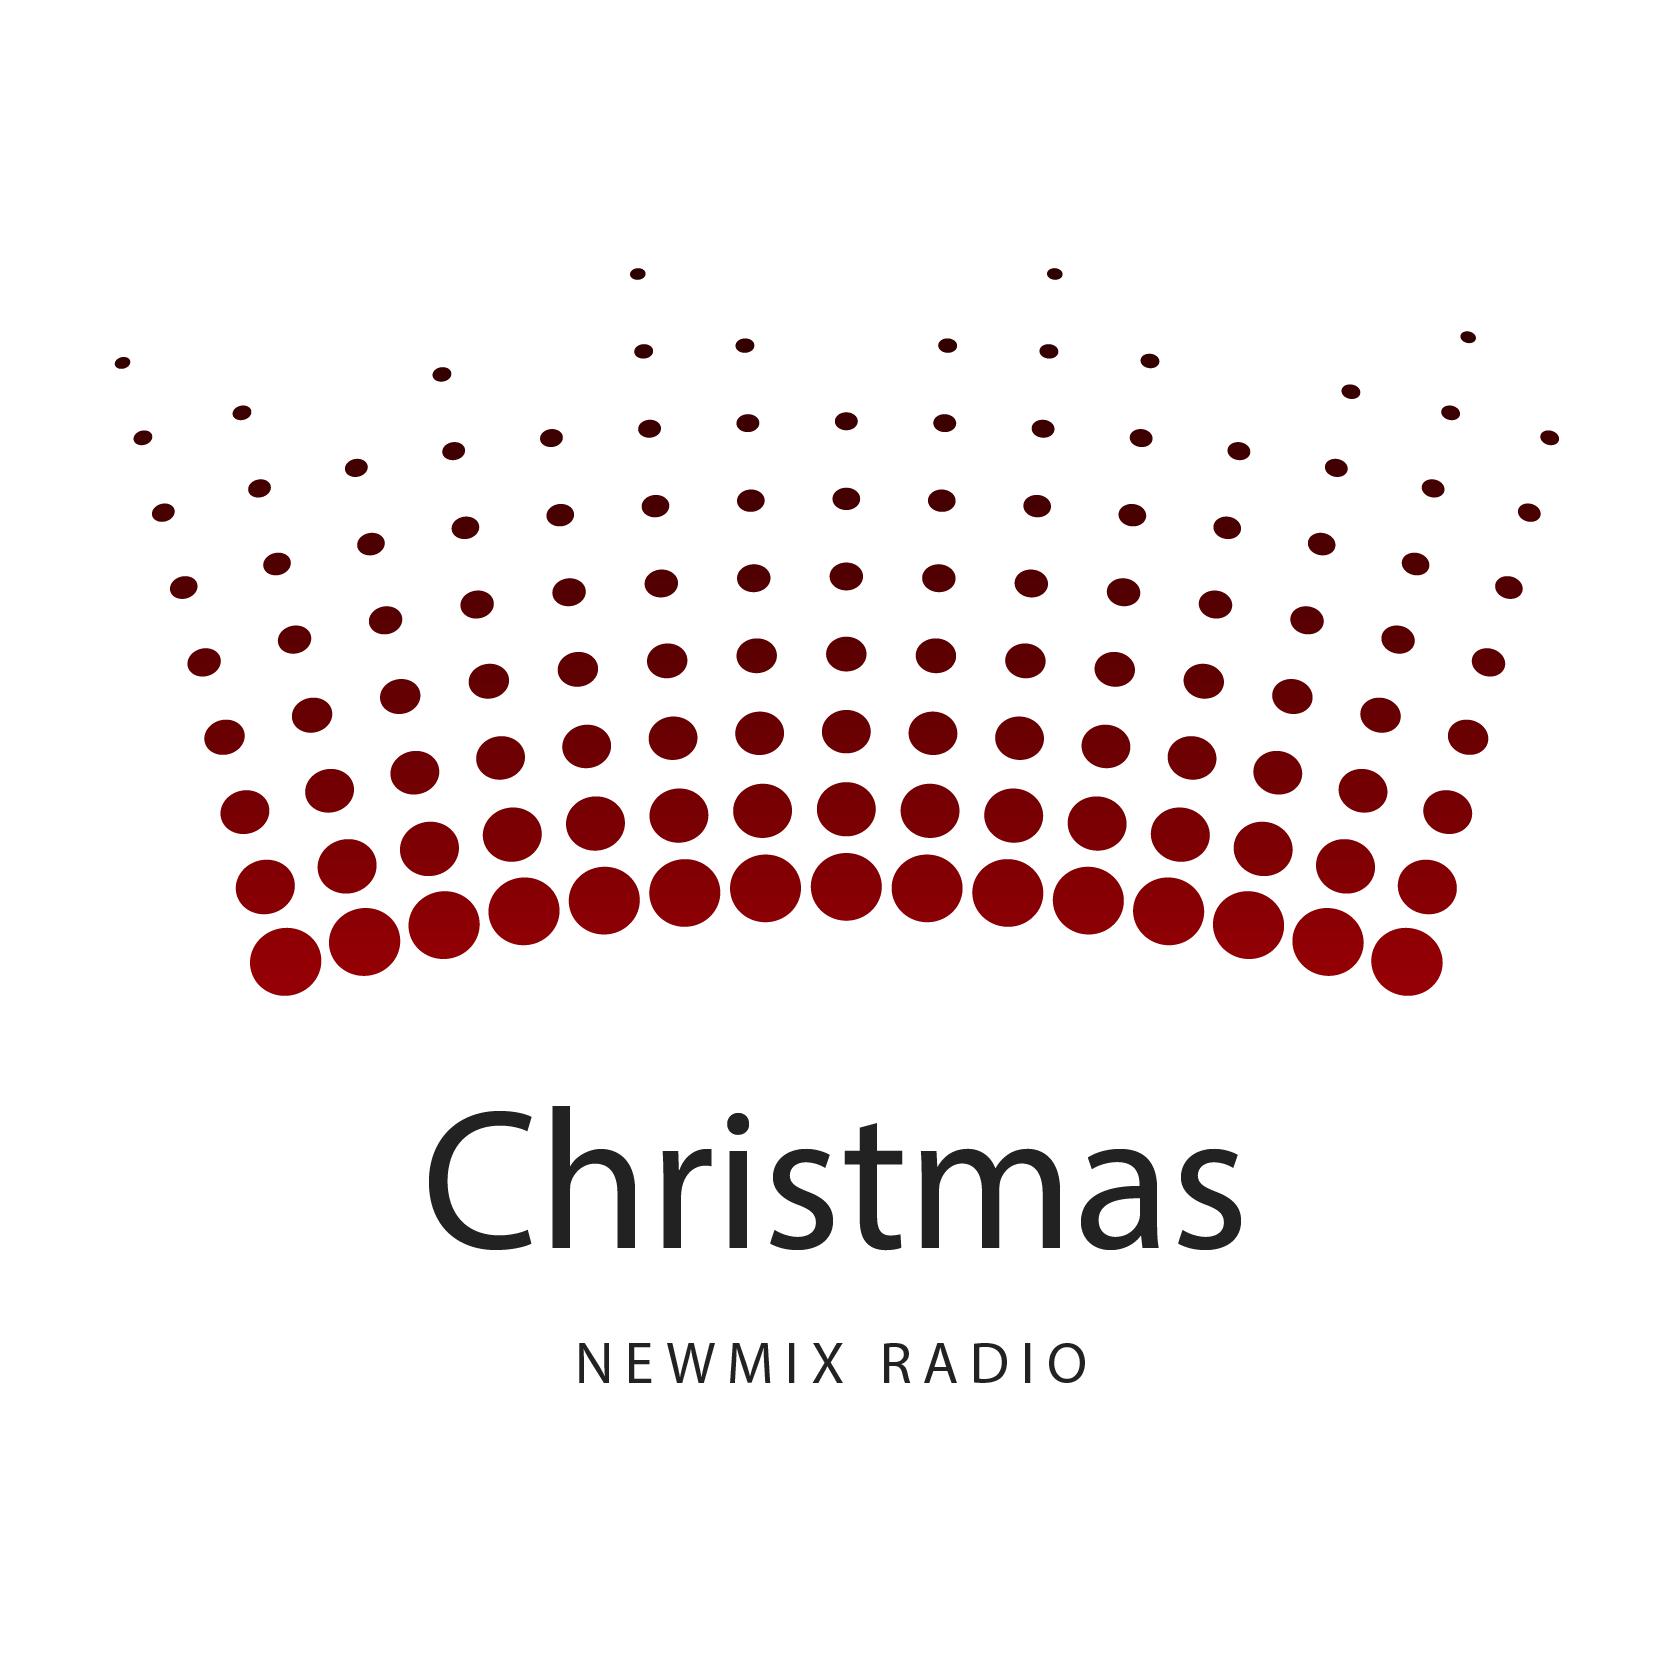 A_A Christmas